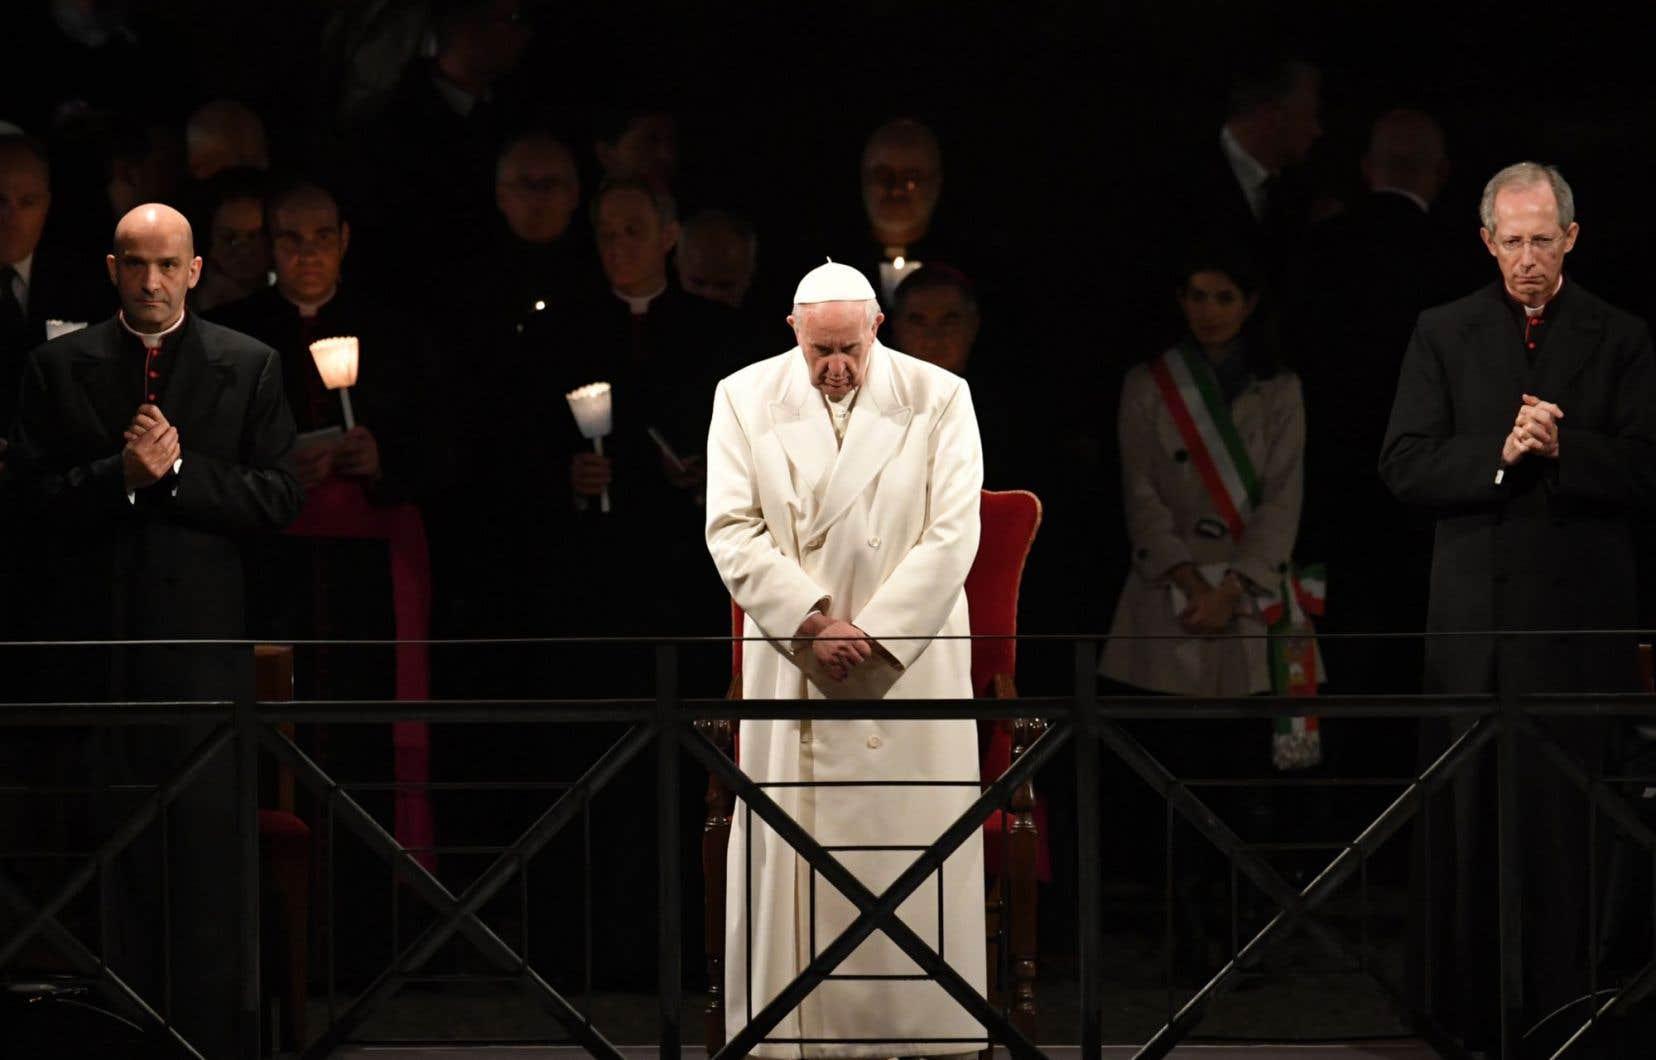 Le Pape Exprime  U00abla Honte U00bb Du Sang Innocent Vers U00e9